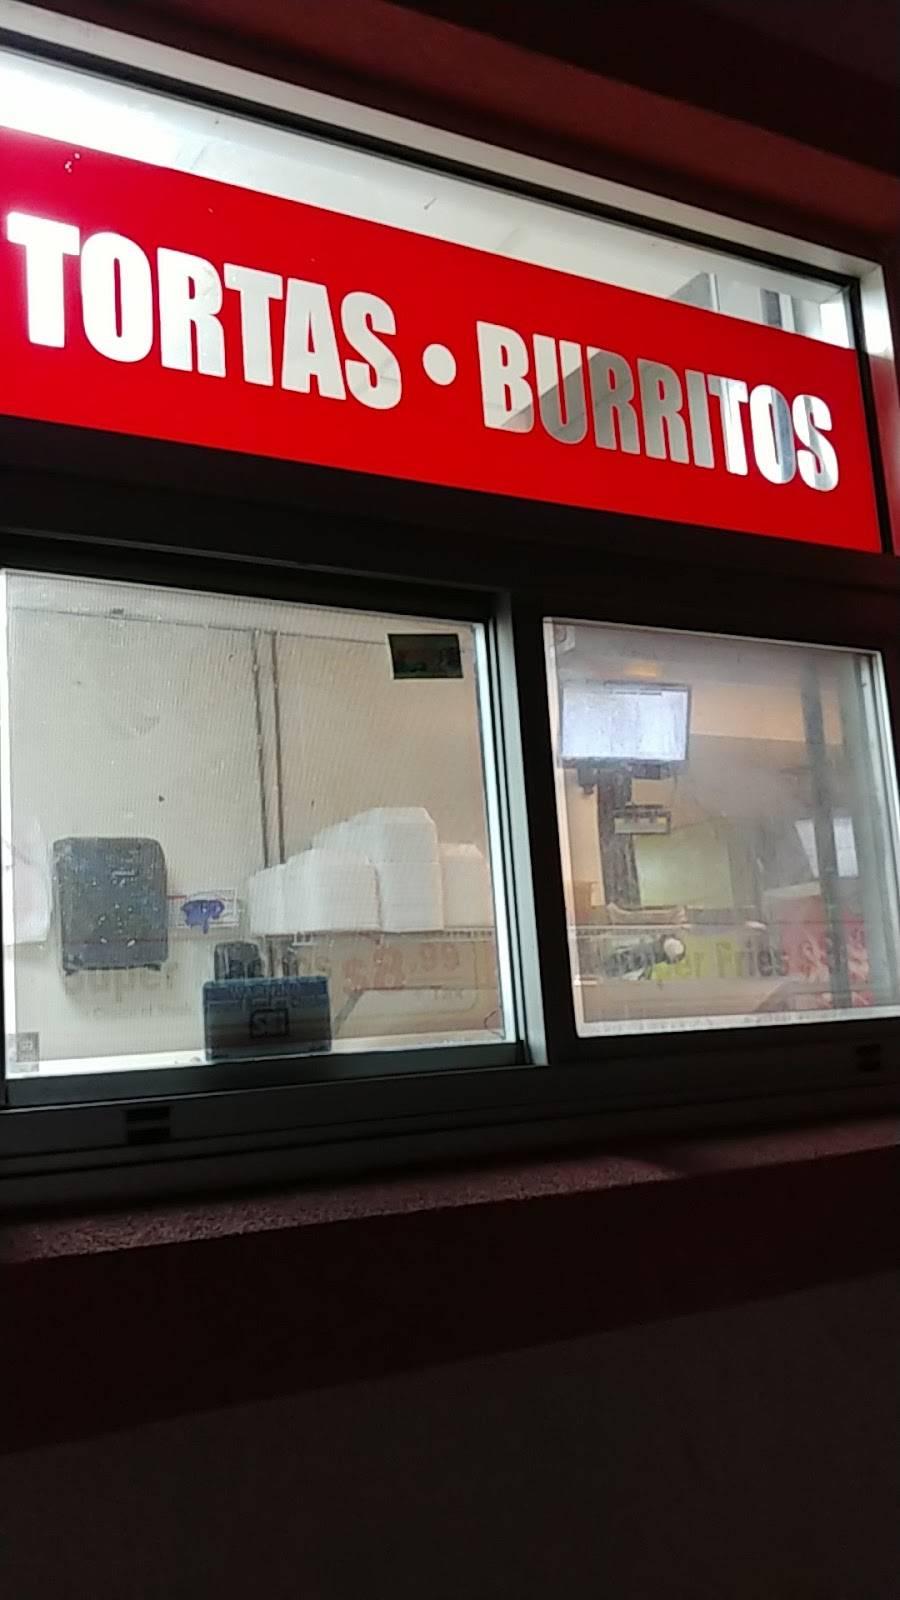 Abelardos | Mexican Restaurant - restaurant  | Photo 7 of 10 | Address: 3540 Center St, Omaha, NE 68105, USA | Phone: (402) 999-8039